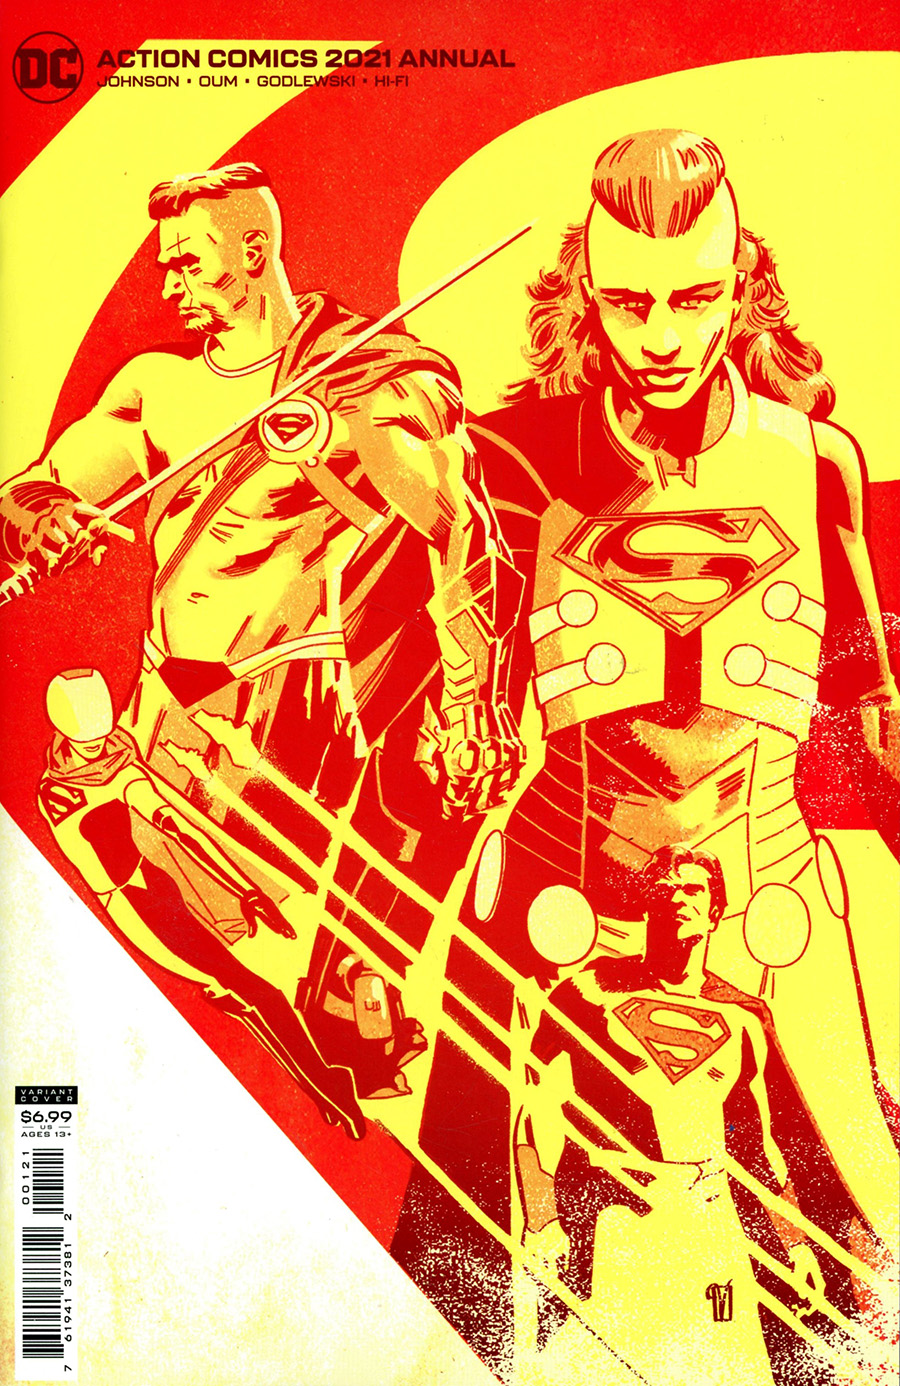 Action Comics Vol 2 Annual 2021 #1 Cover B Variant Valentine De Landro Card Stock Cover